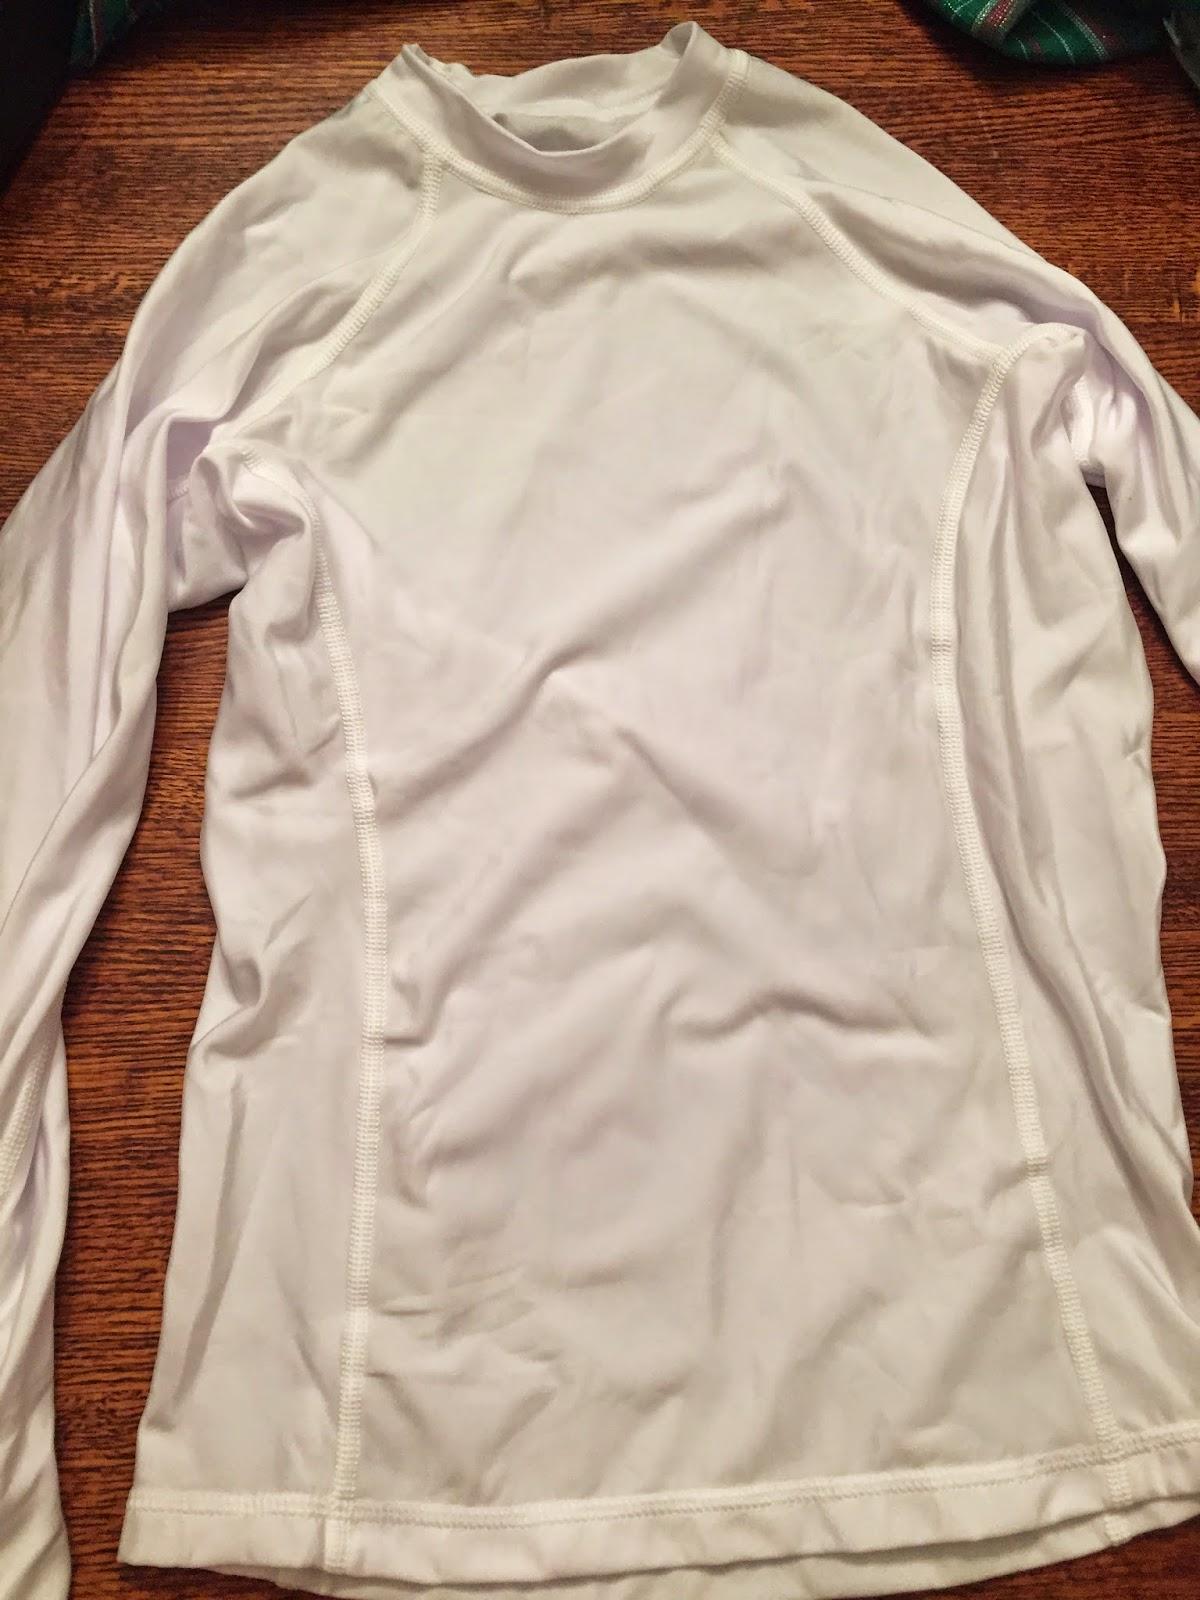 surfer-shirt-in-white